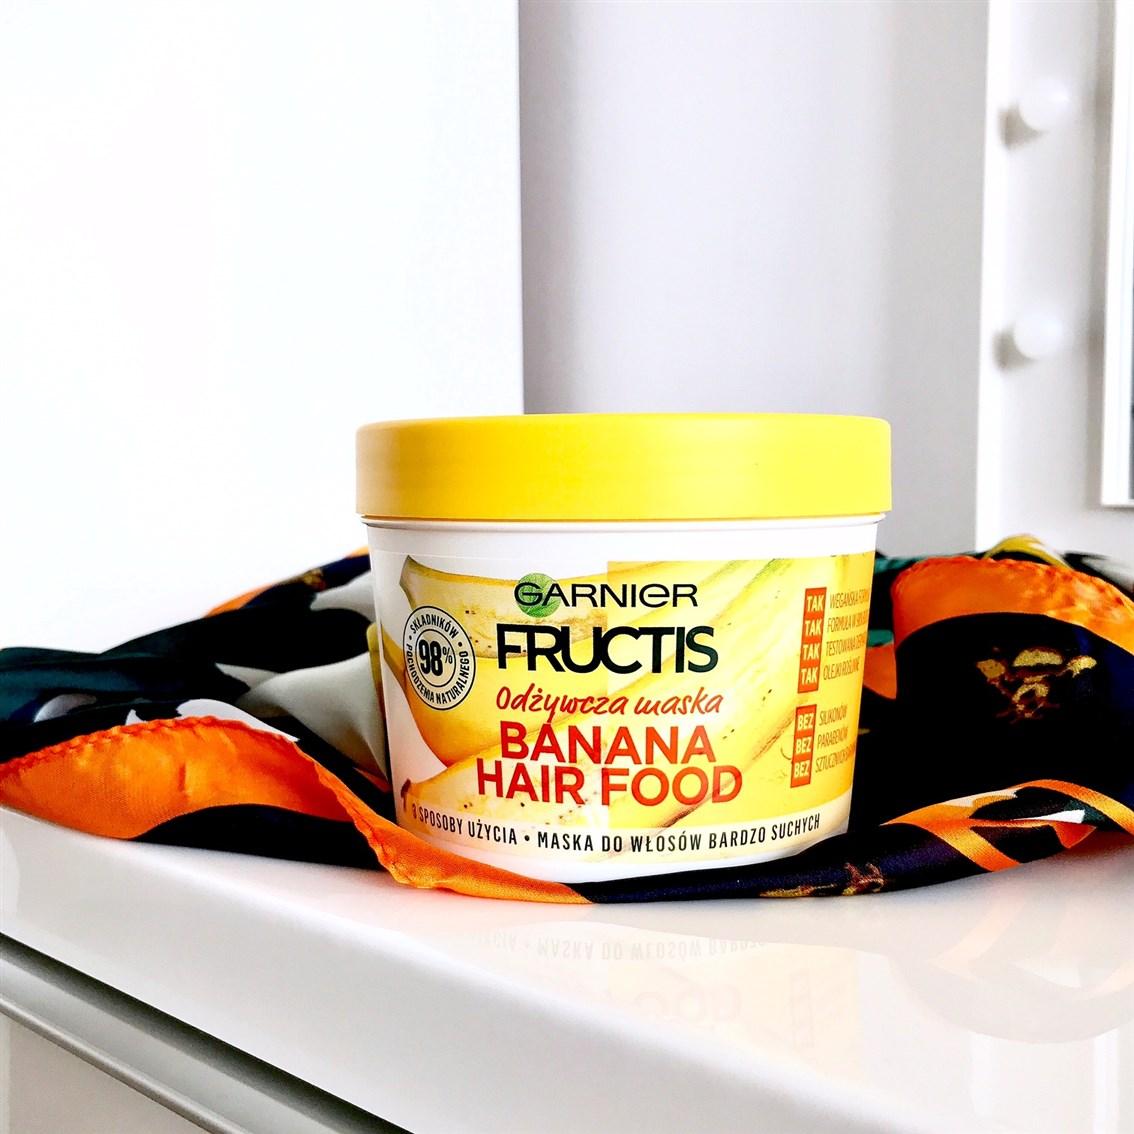 zdjęcie maski Garnier Fructis Banana Hair Food